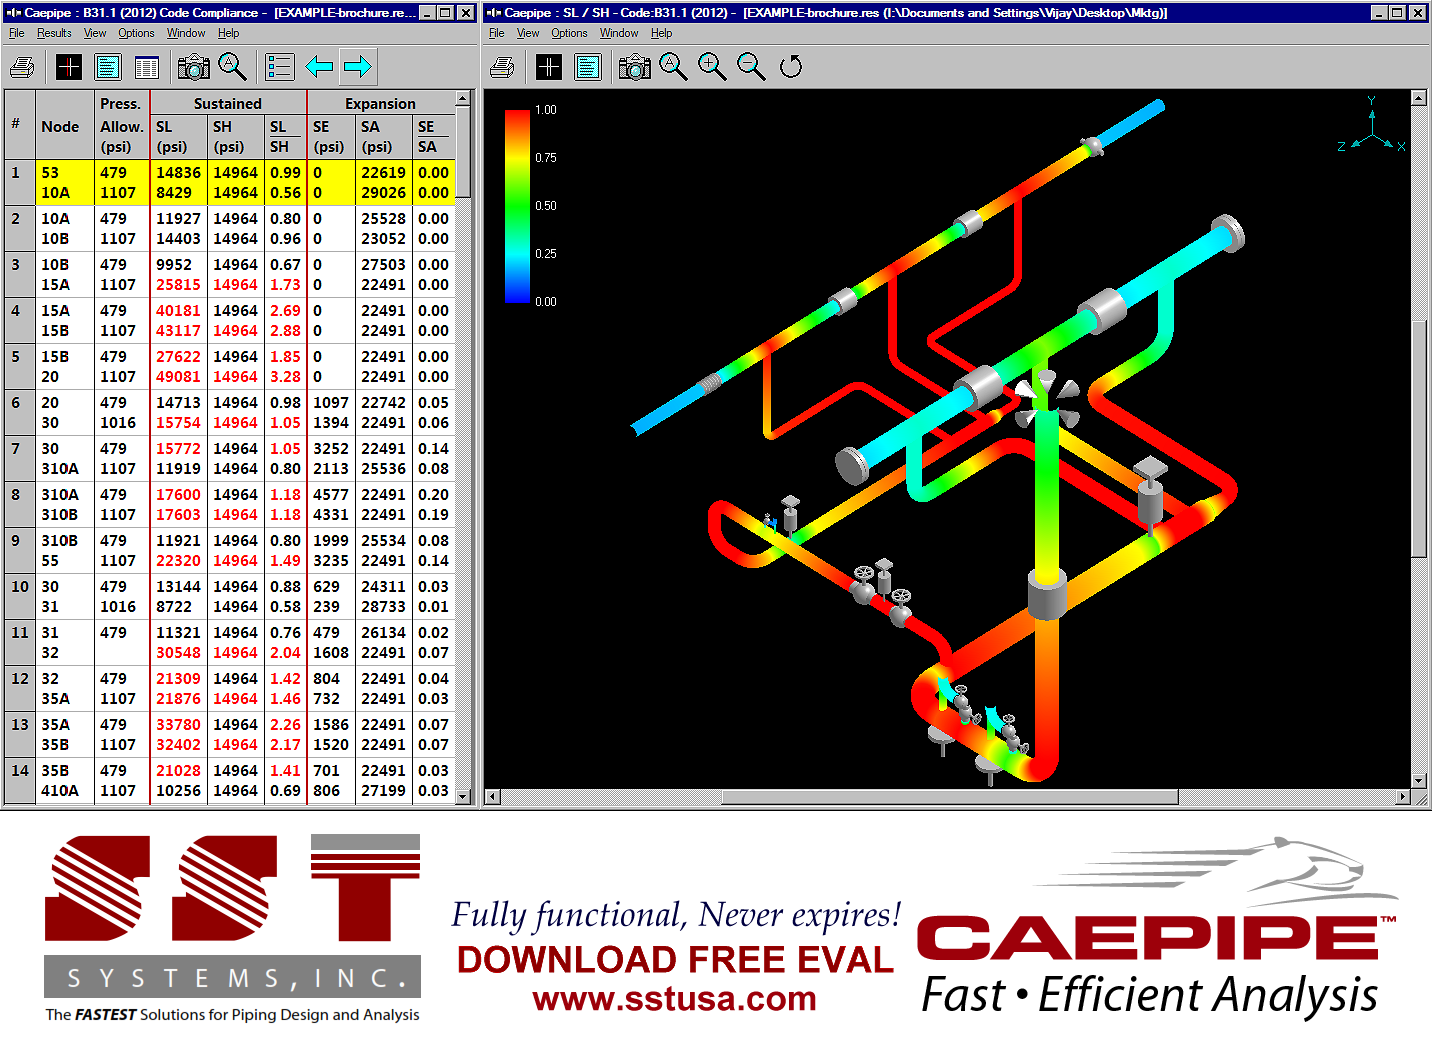 caepipe 7 press release screen shot 1 - Piping Design Software Free